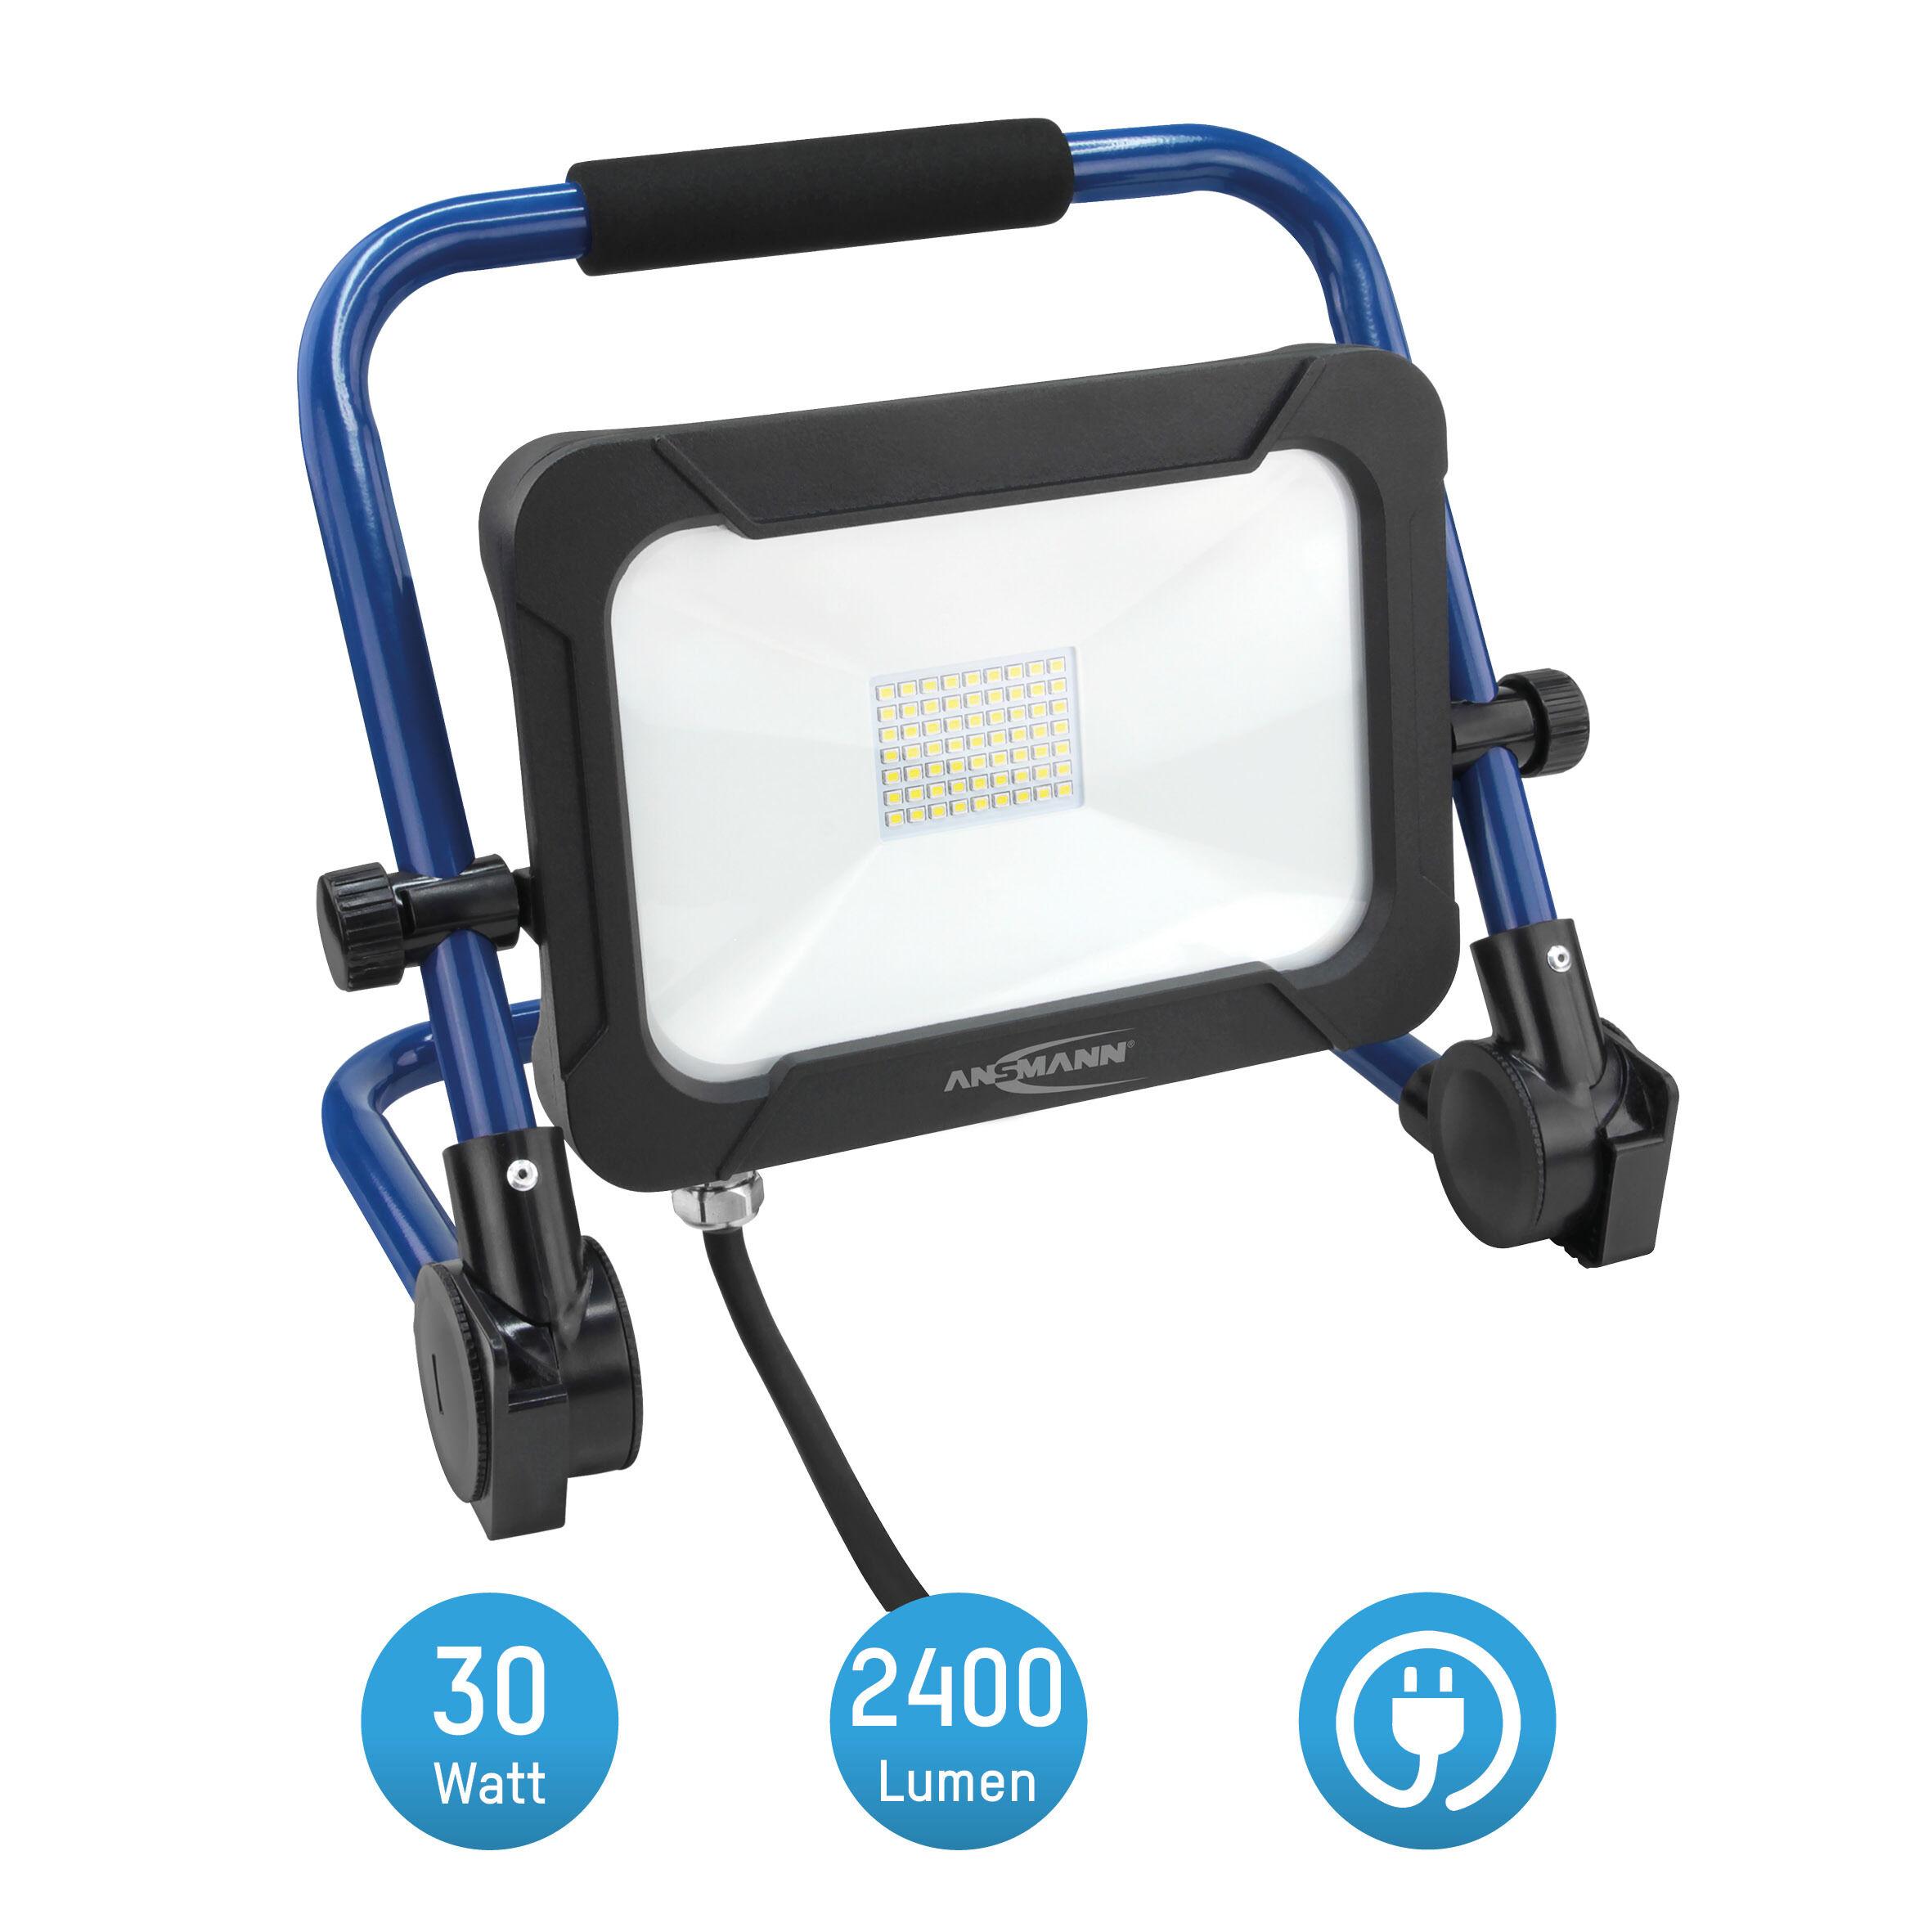 ANSMANN Baustrahler LED 30W – Baustellen Lampe, Bau Leuchte, IP54 wetterfest